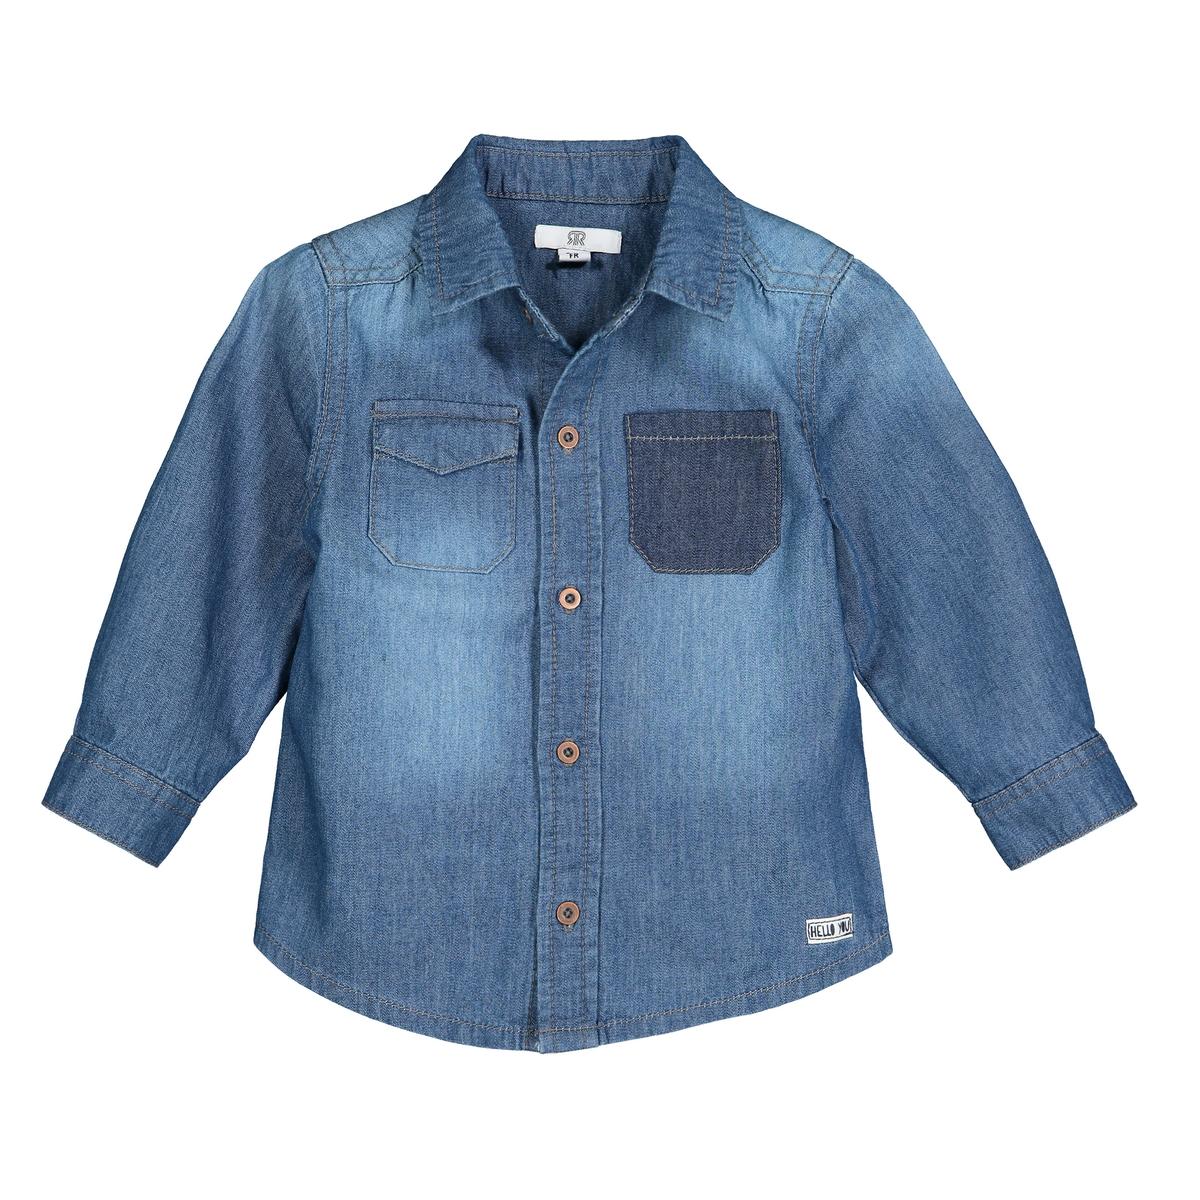 Рубашка La Redoute Из денима мес- года 2 года - 86 см синий комплект из предметов топ la redoute и шаровары мес года 1 мес 54 см синий